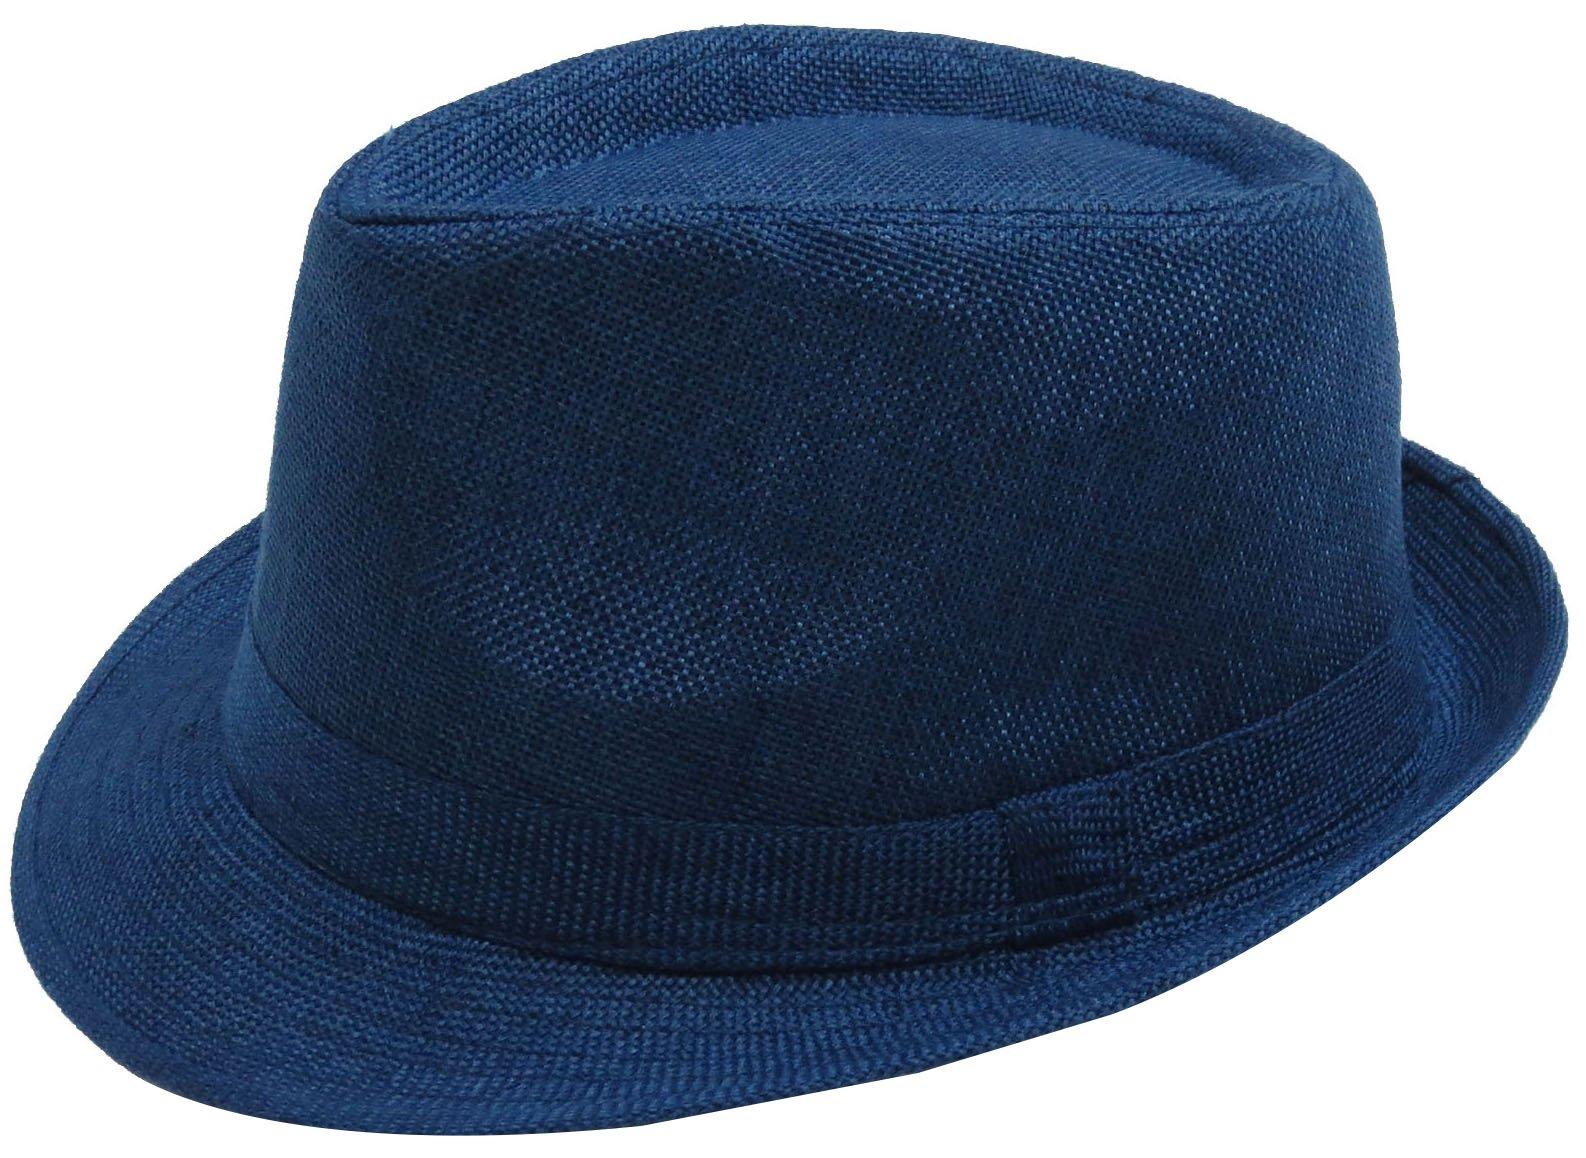 Simplicity Women Men Summer Gangster Trilby Straw Fedora Hat Cap W/Brim, Navy